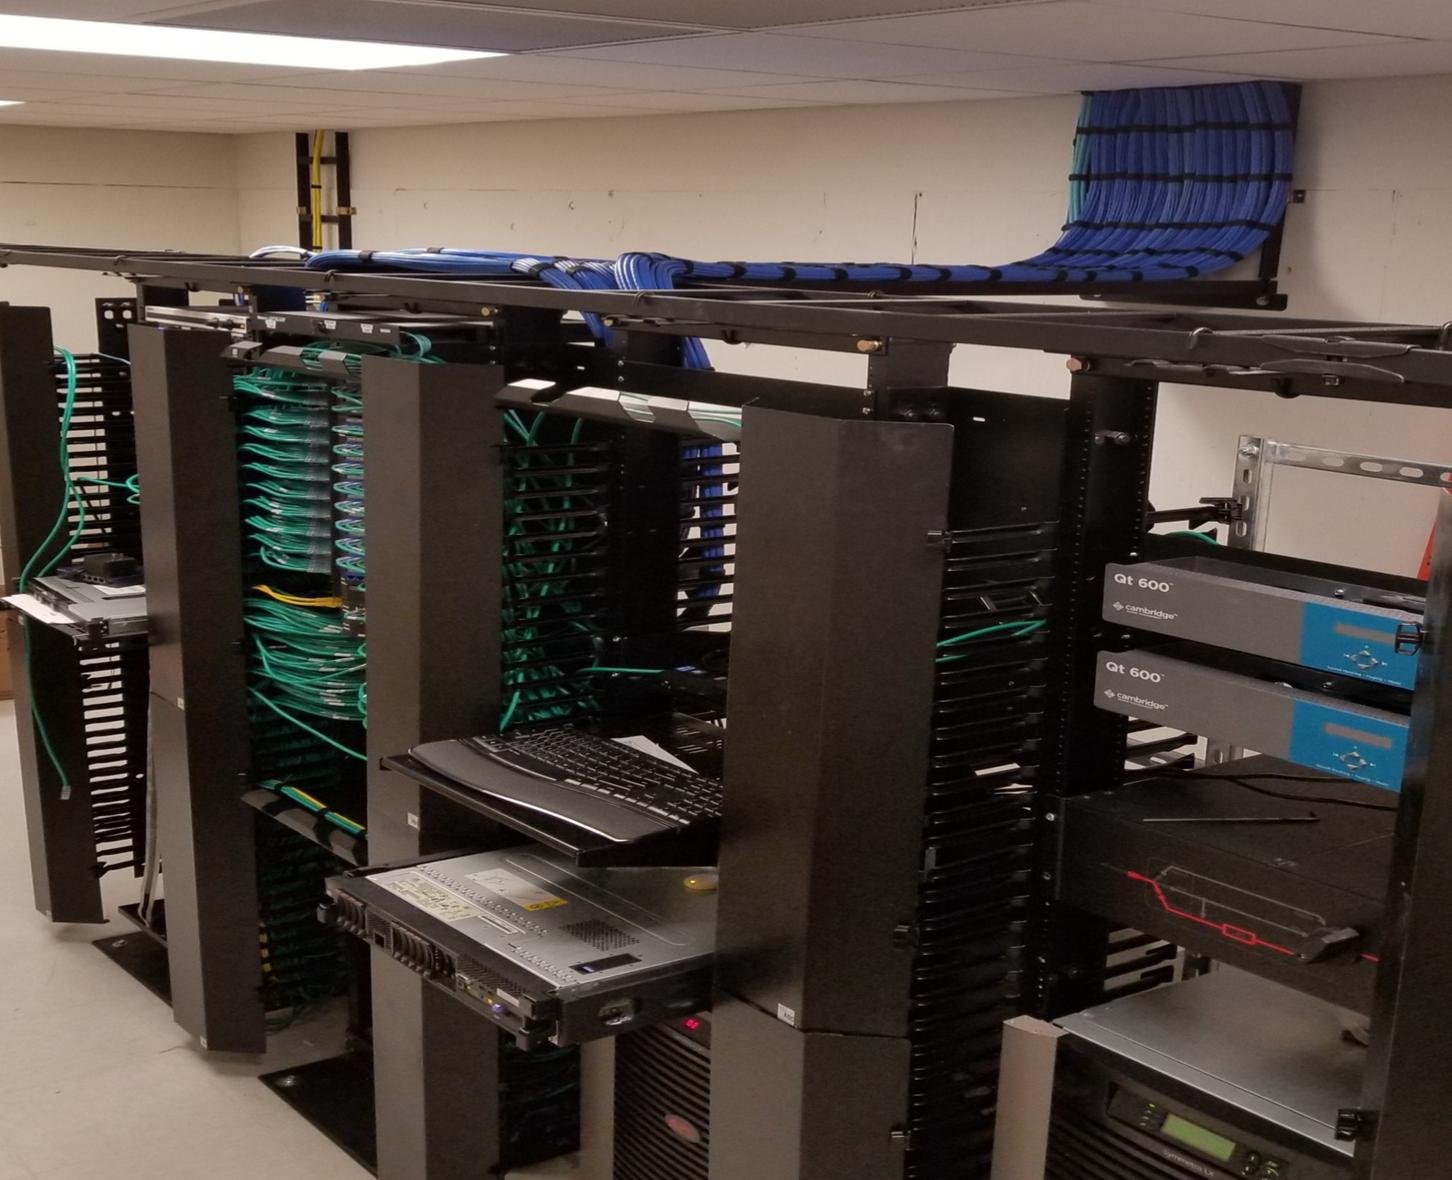 Technology server room